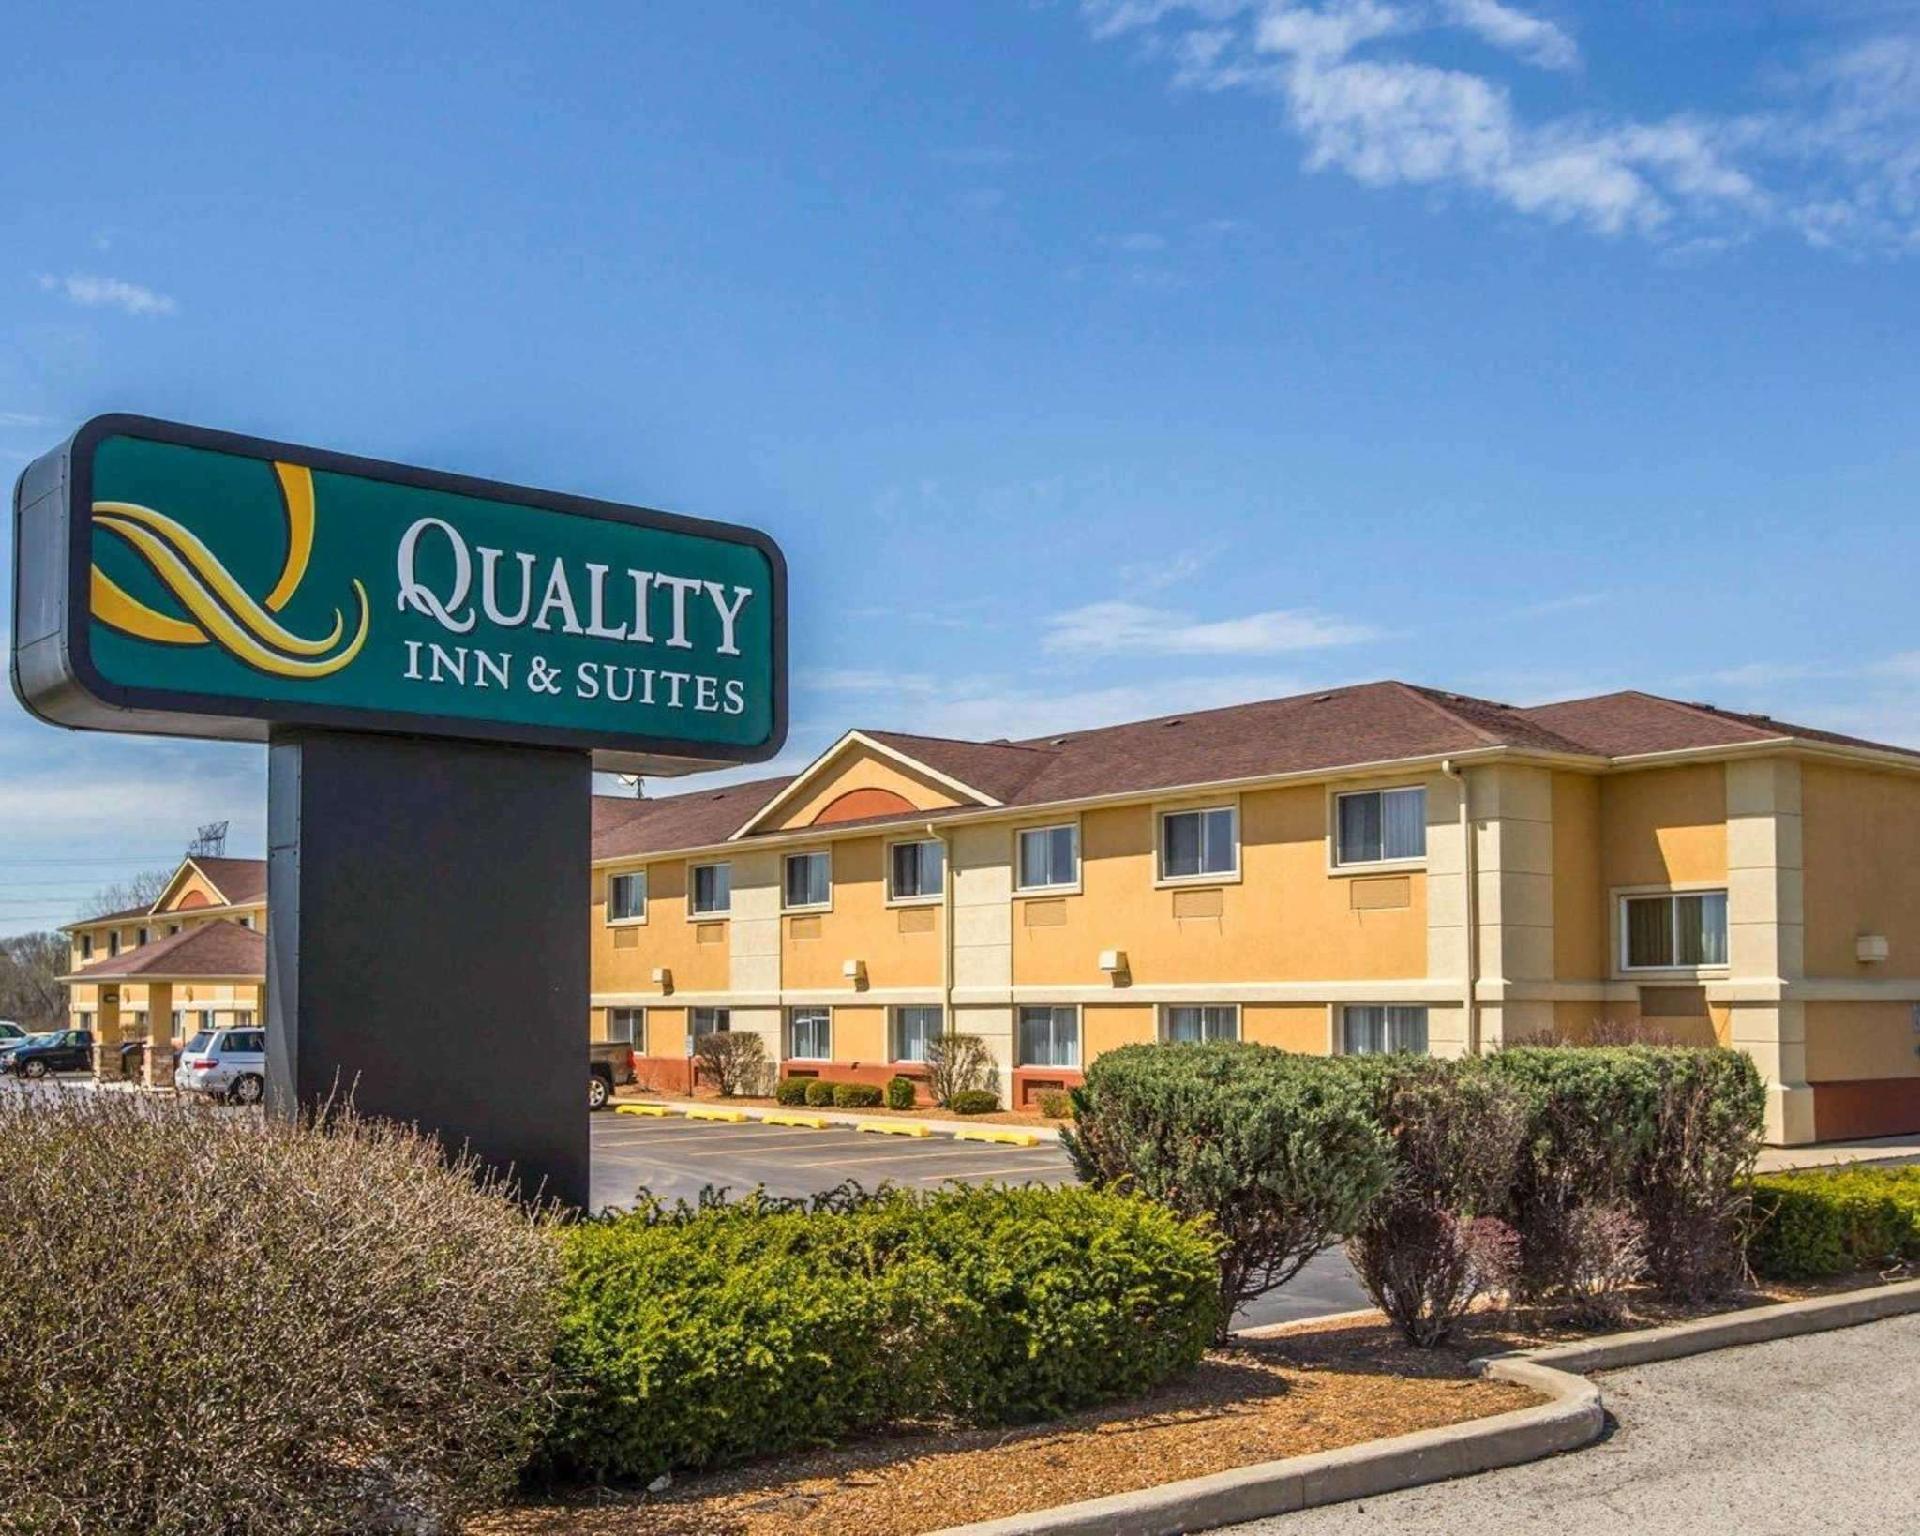 Quality Inn & Suites South Reviews